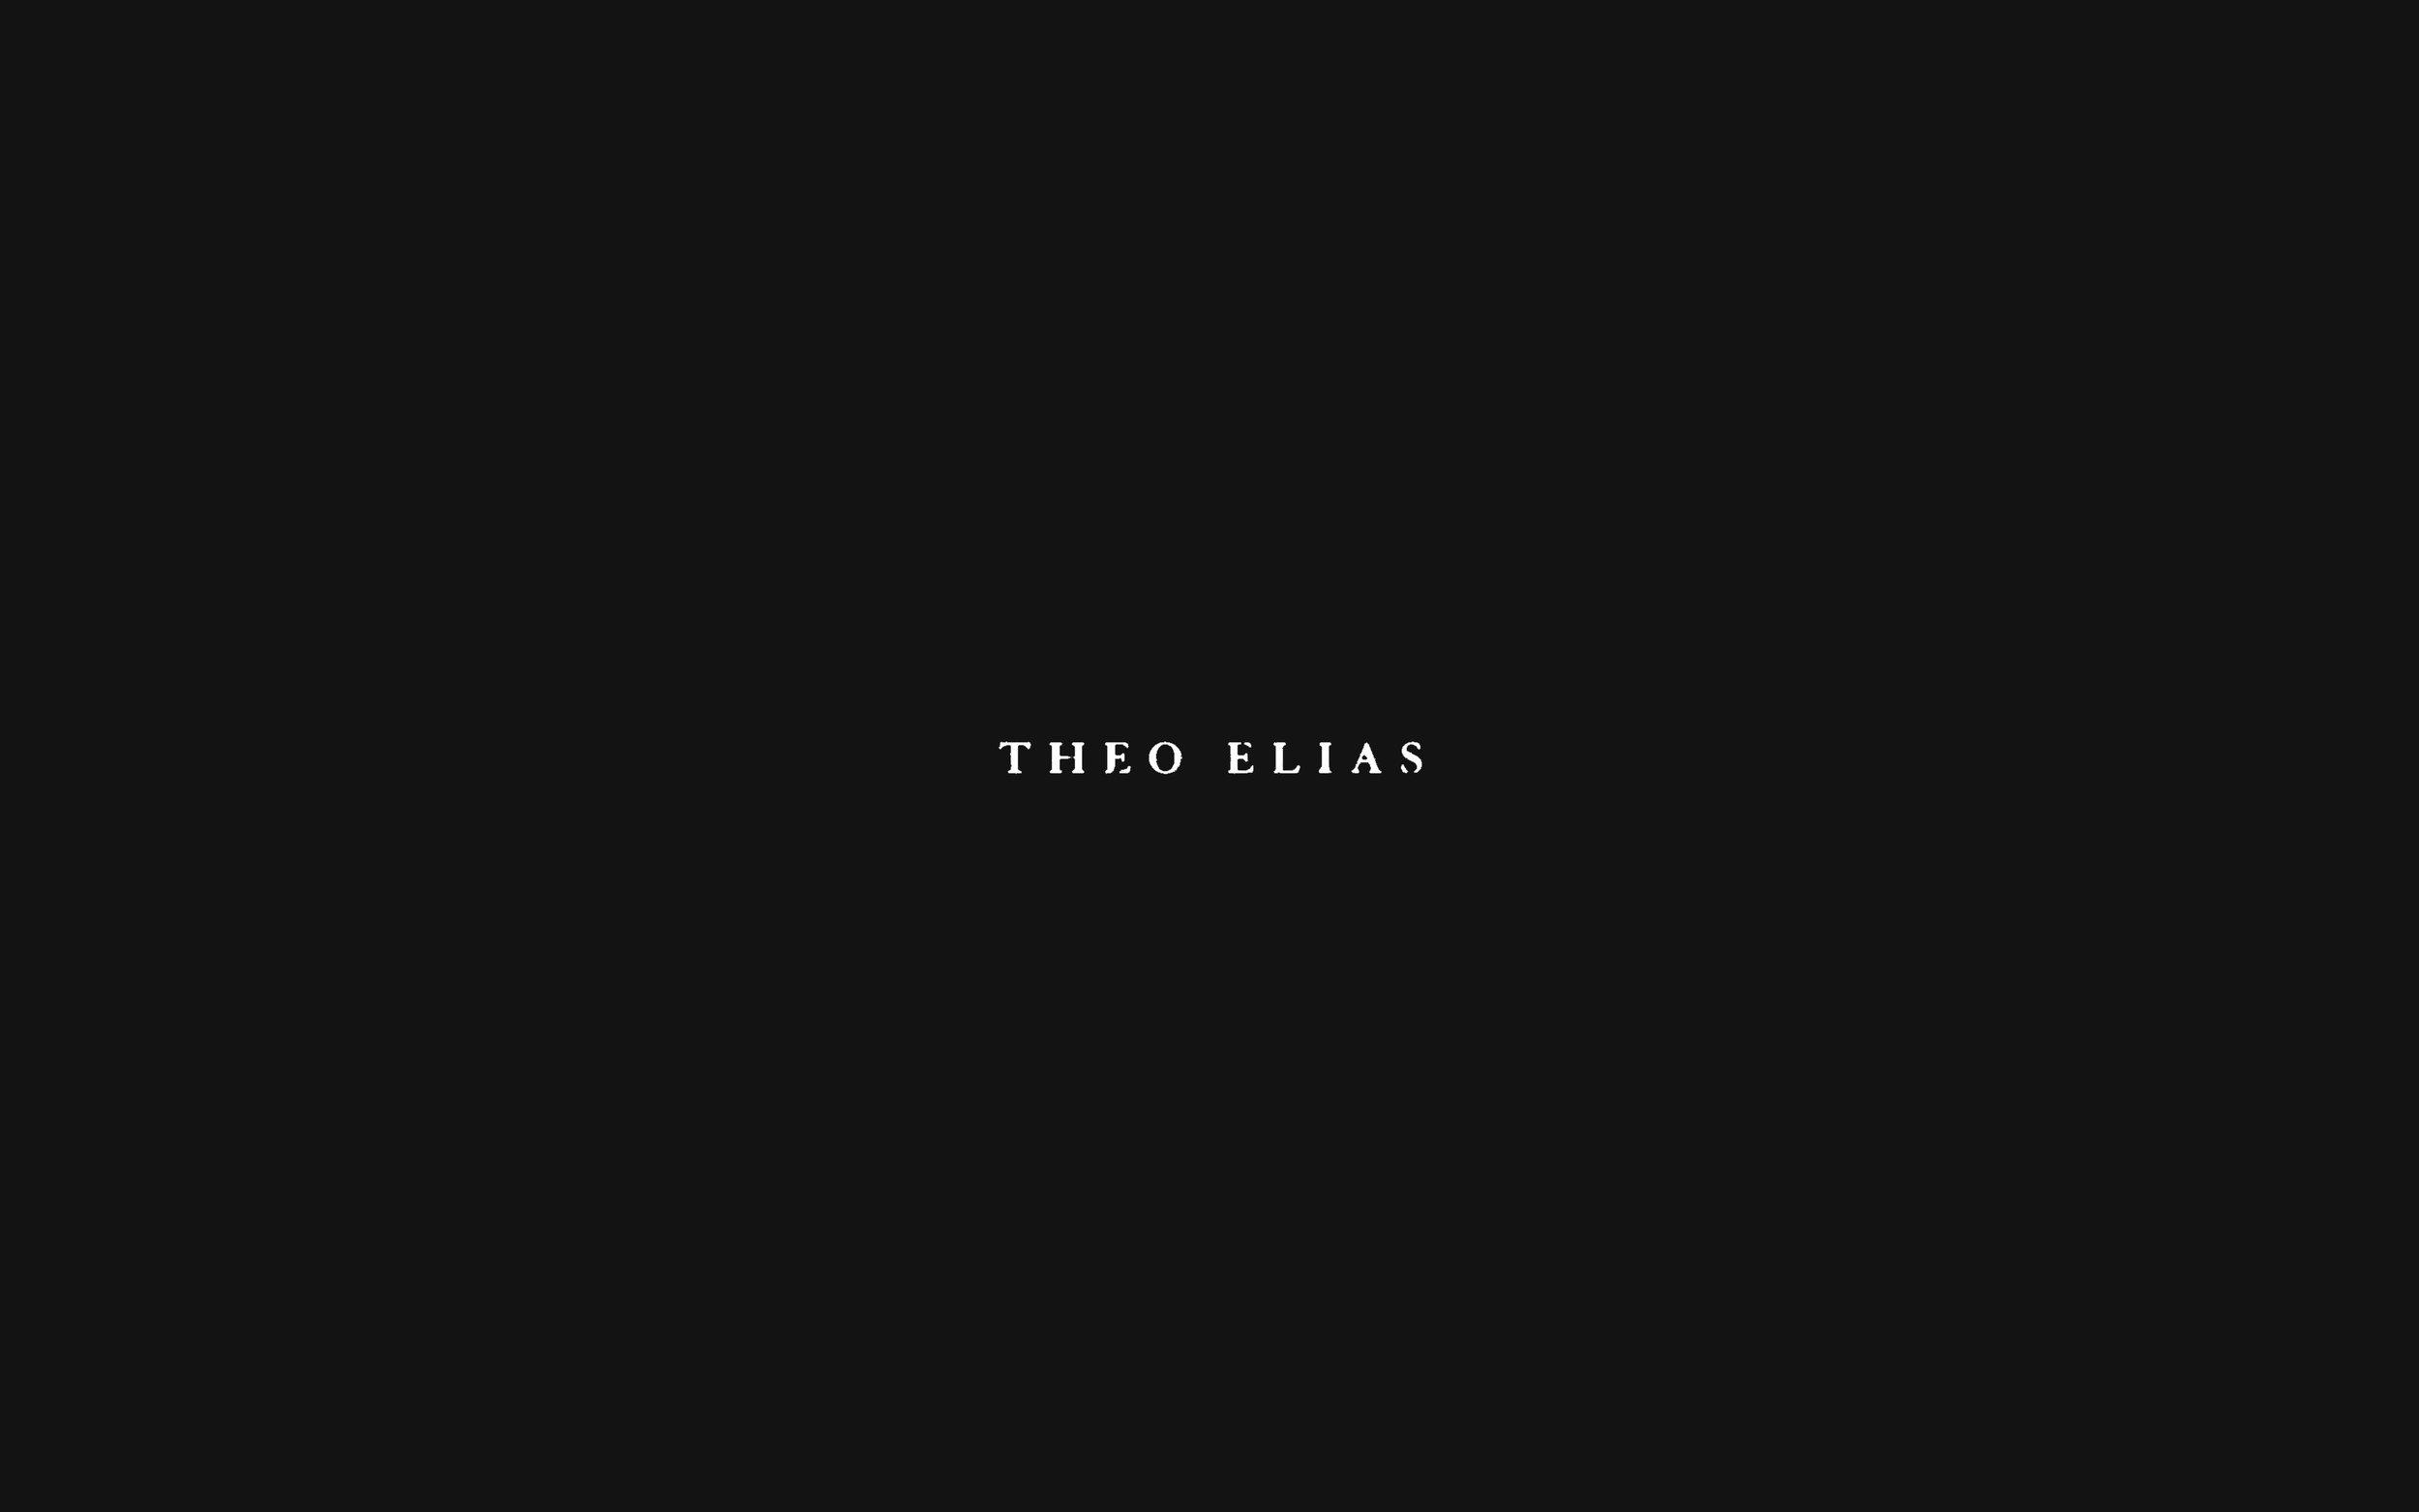 2A__Theo_Elias_00.jpg